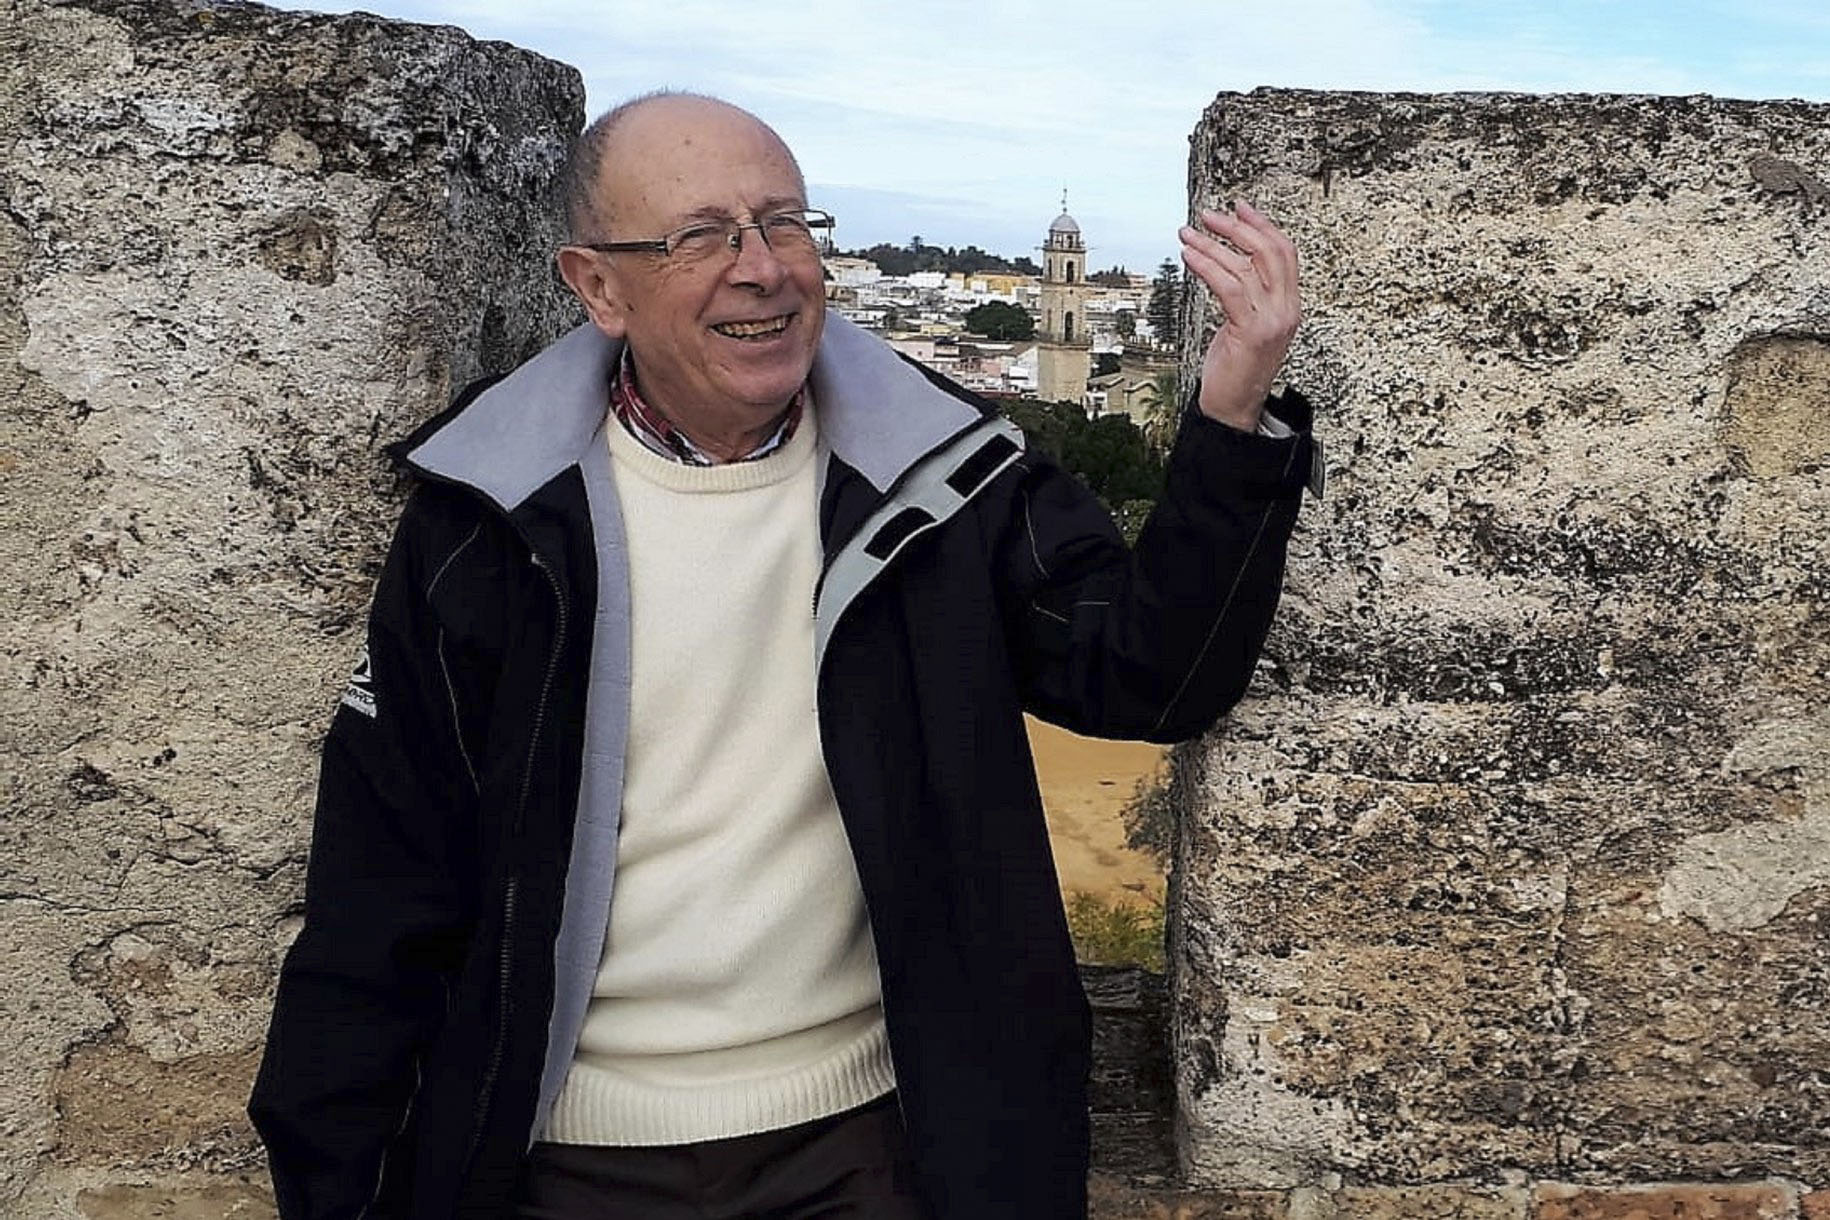 Pepe Moreno, Medalla de Honor Asecan 2019